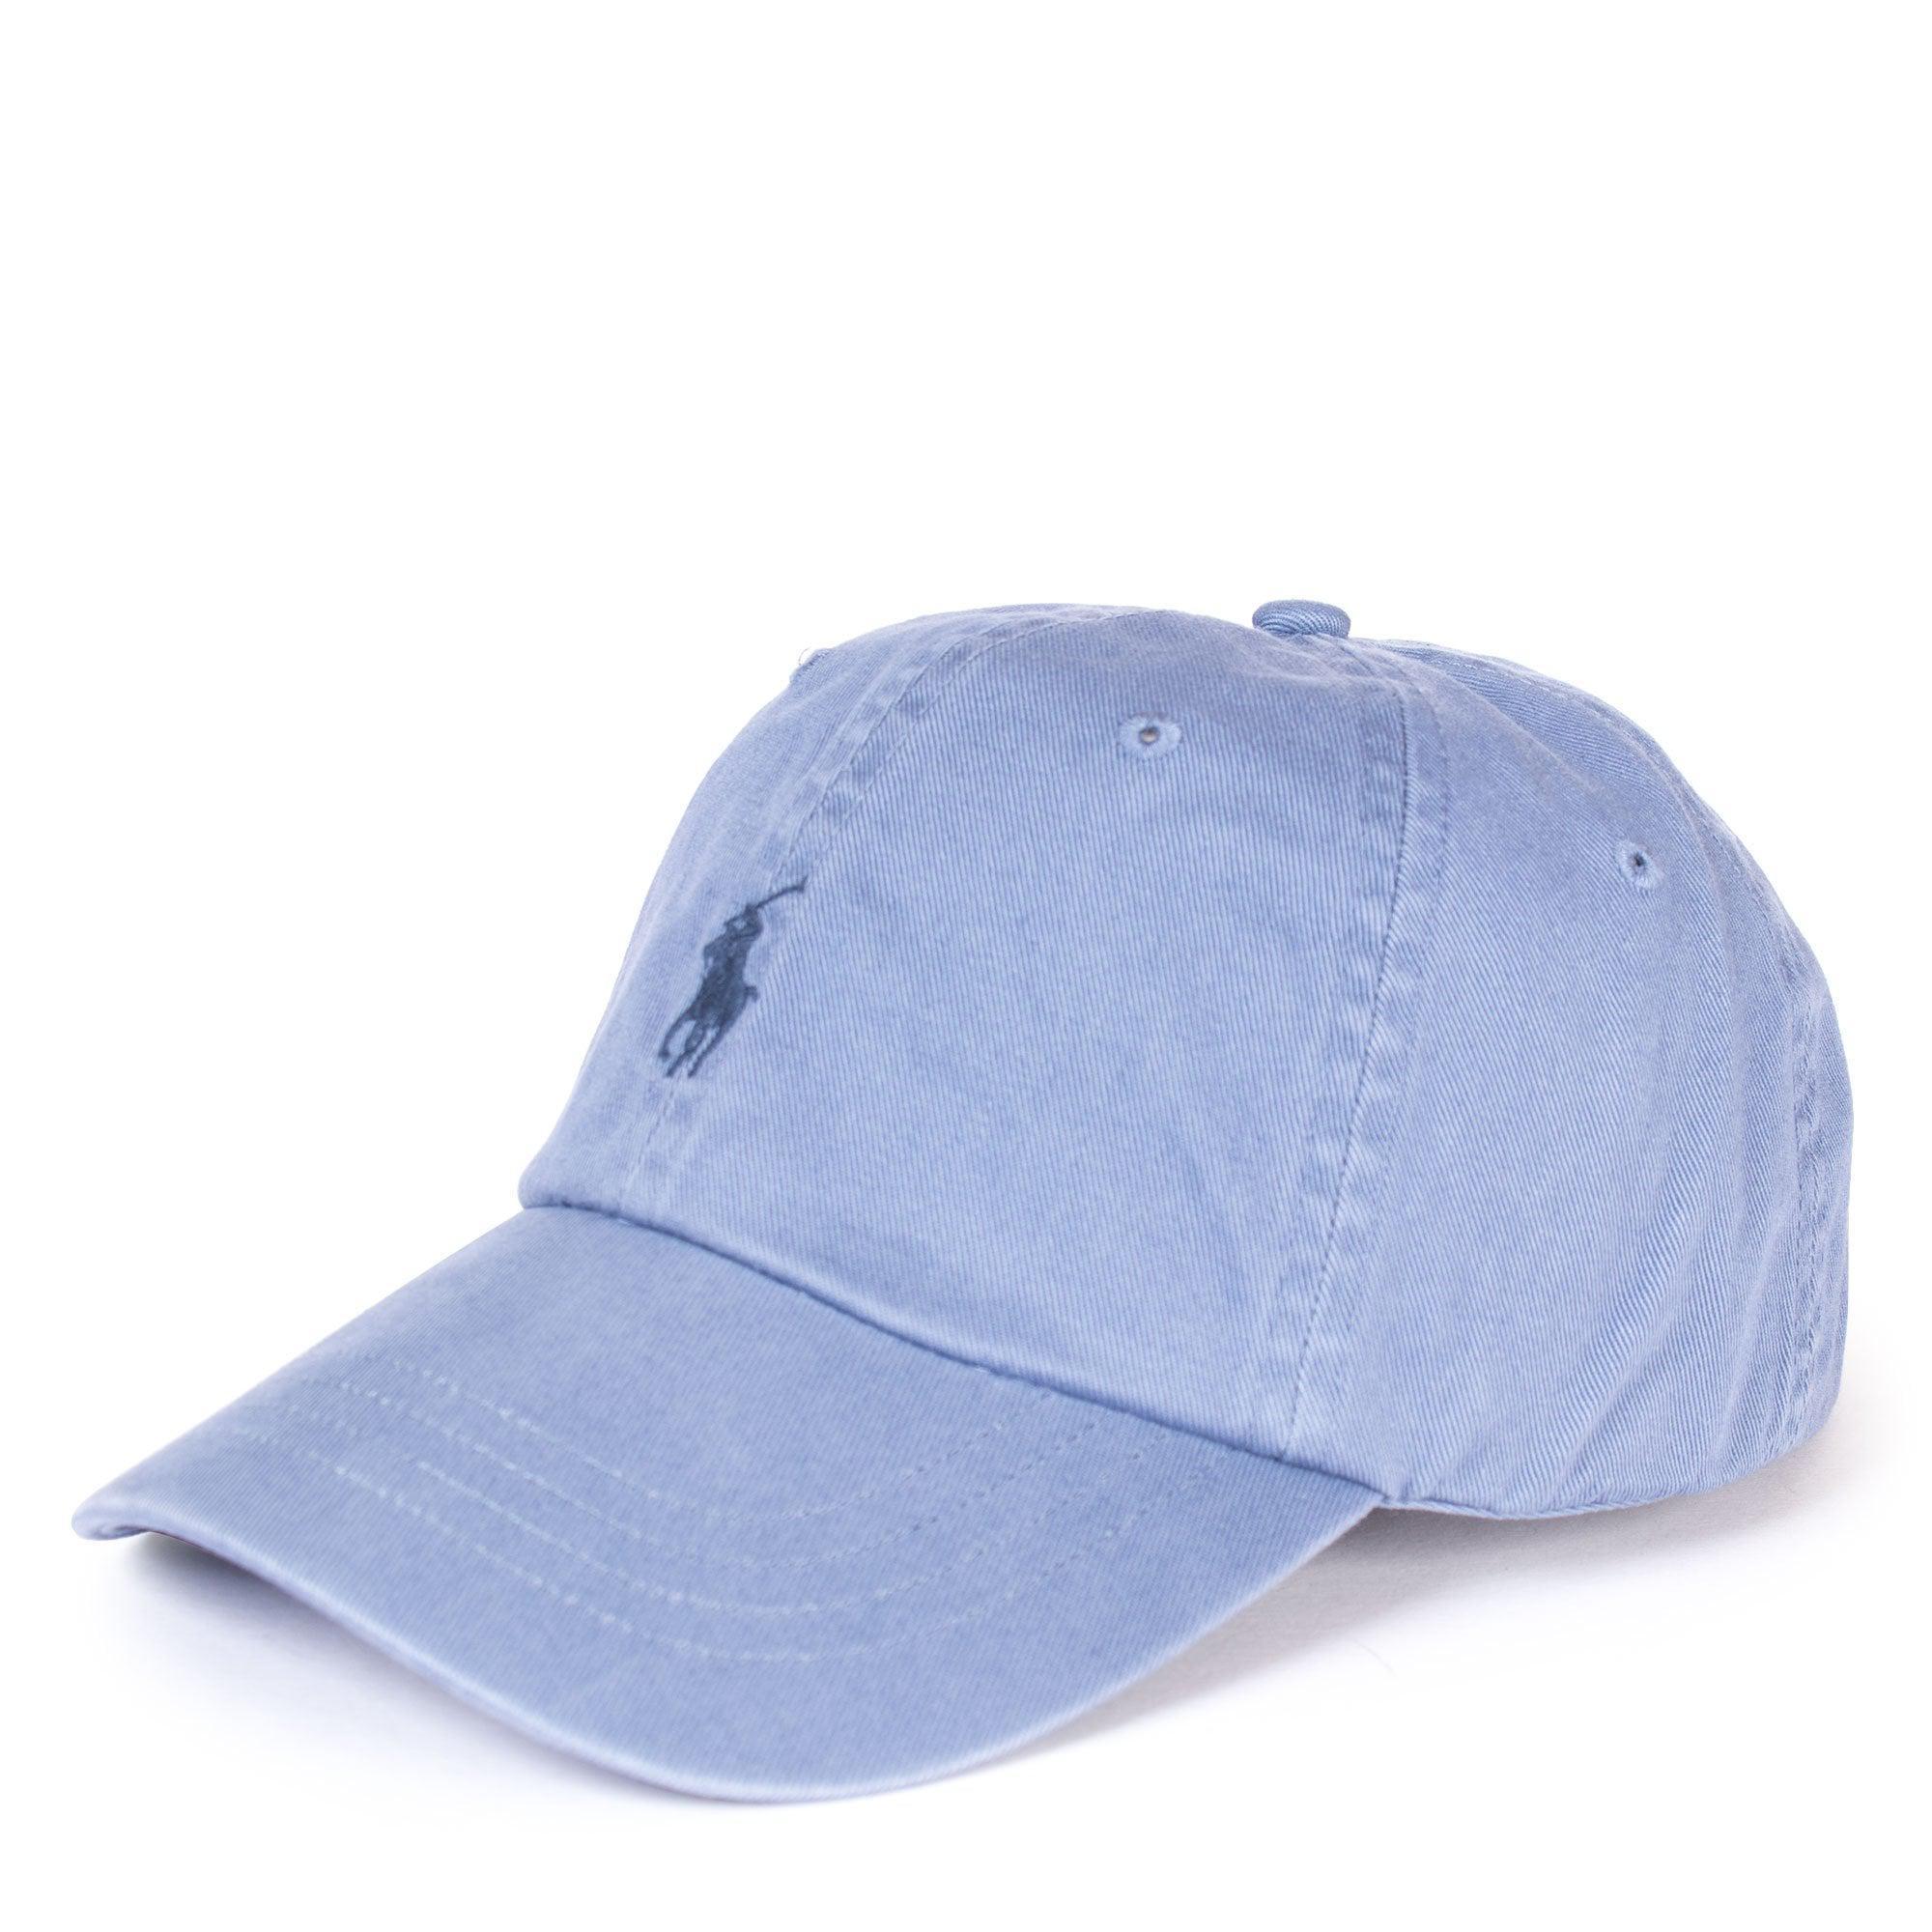 631b64ae3a6c6 Ralph Lauren Sport Cap in Blue for Men - Lyst